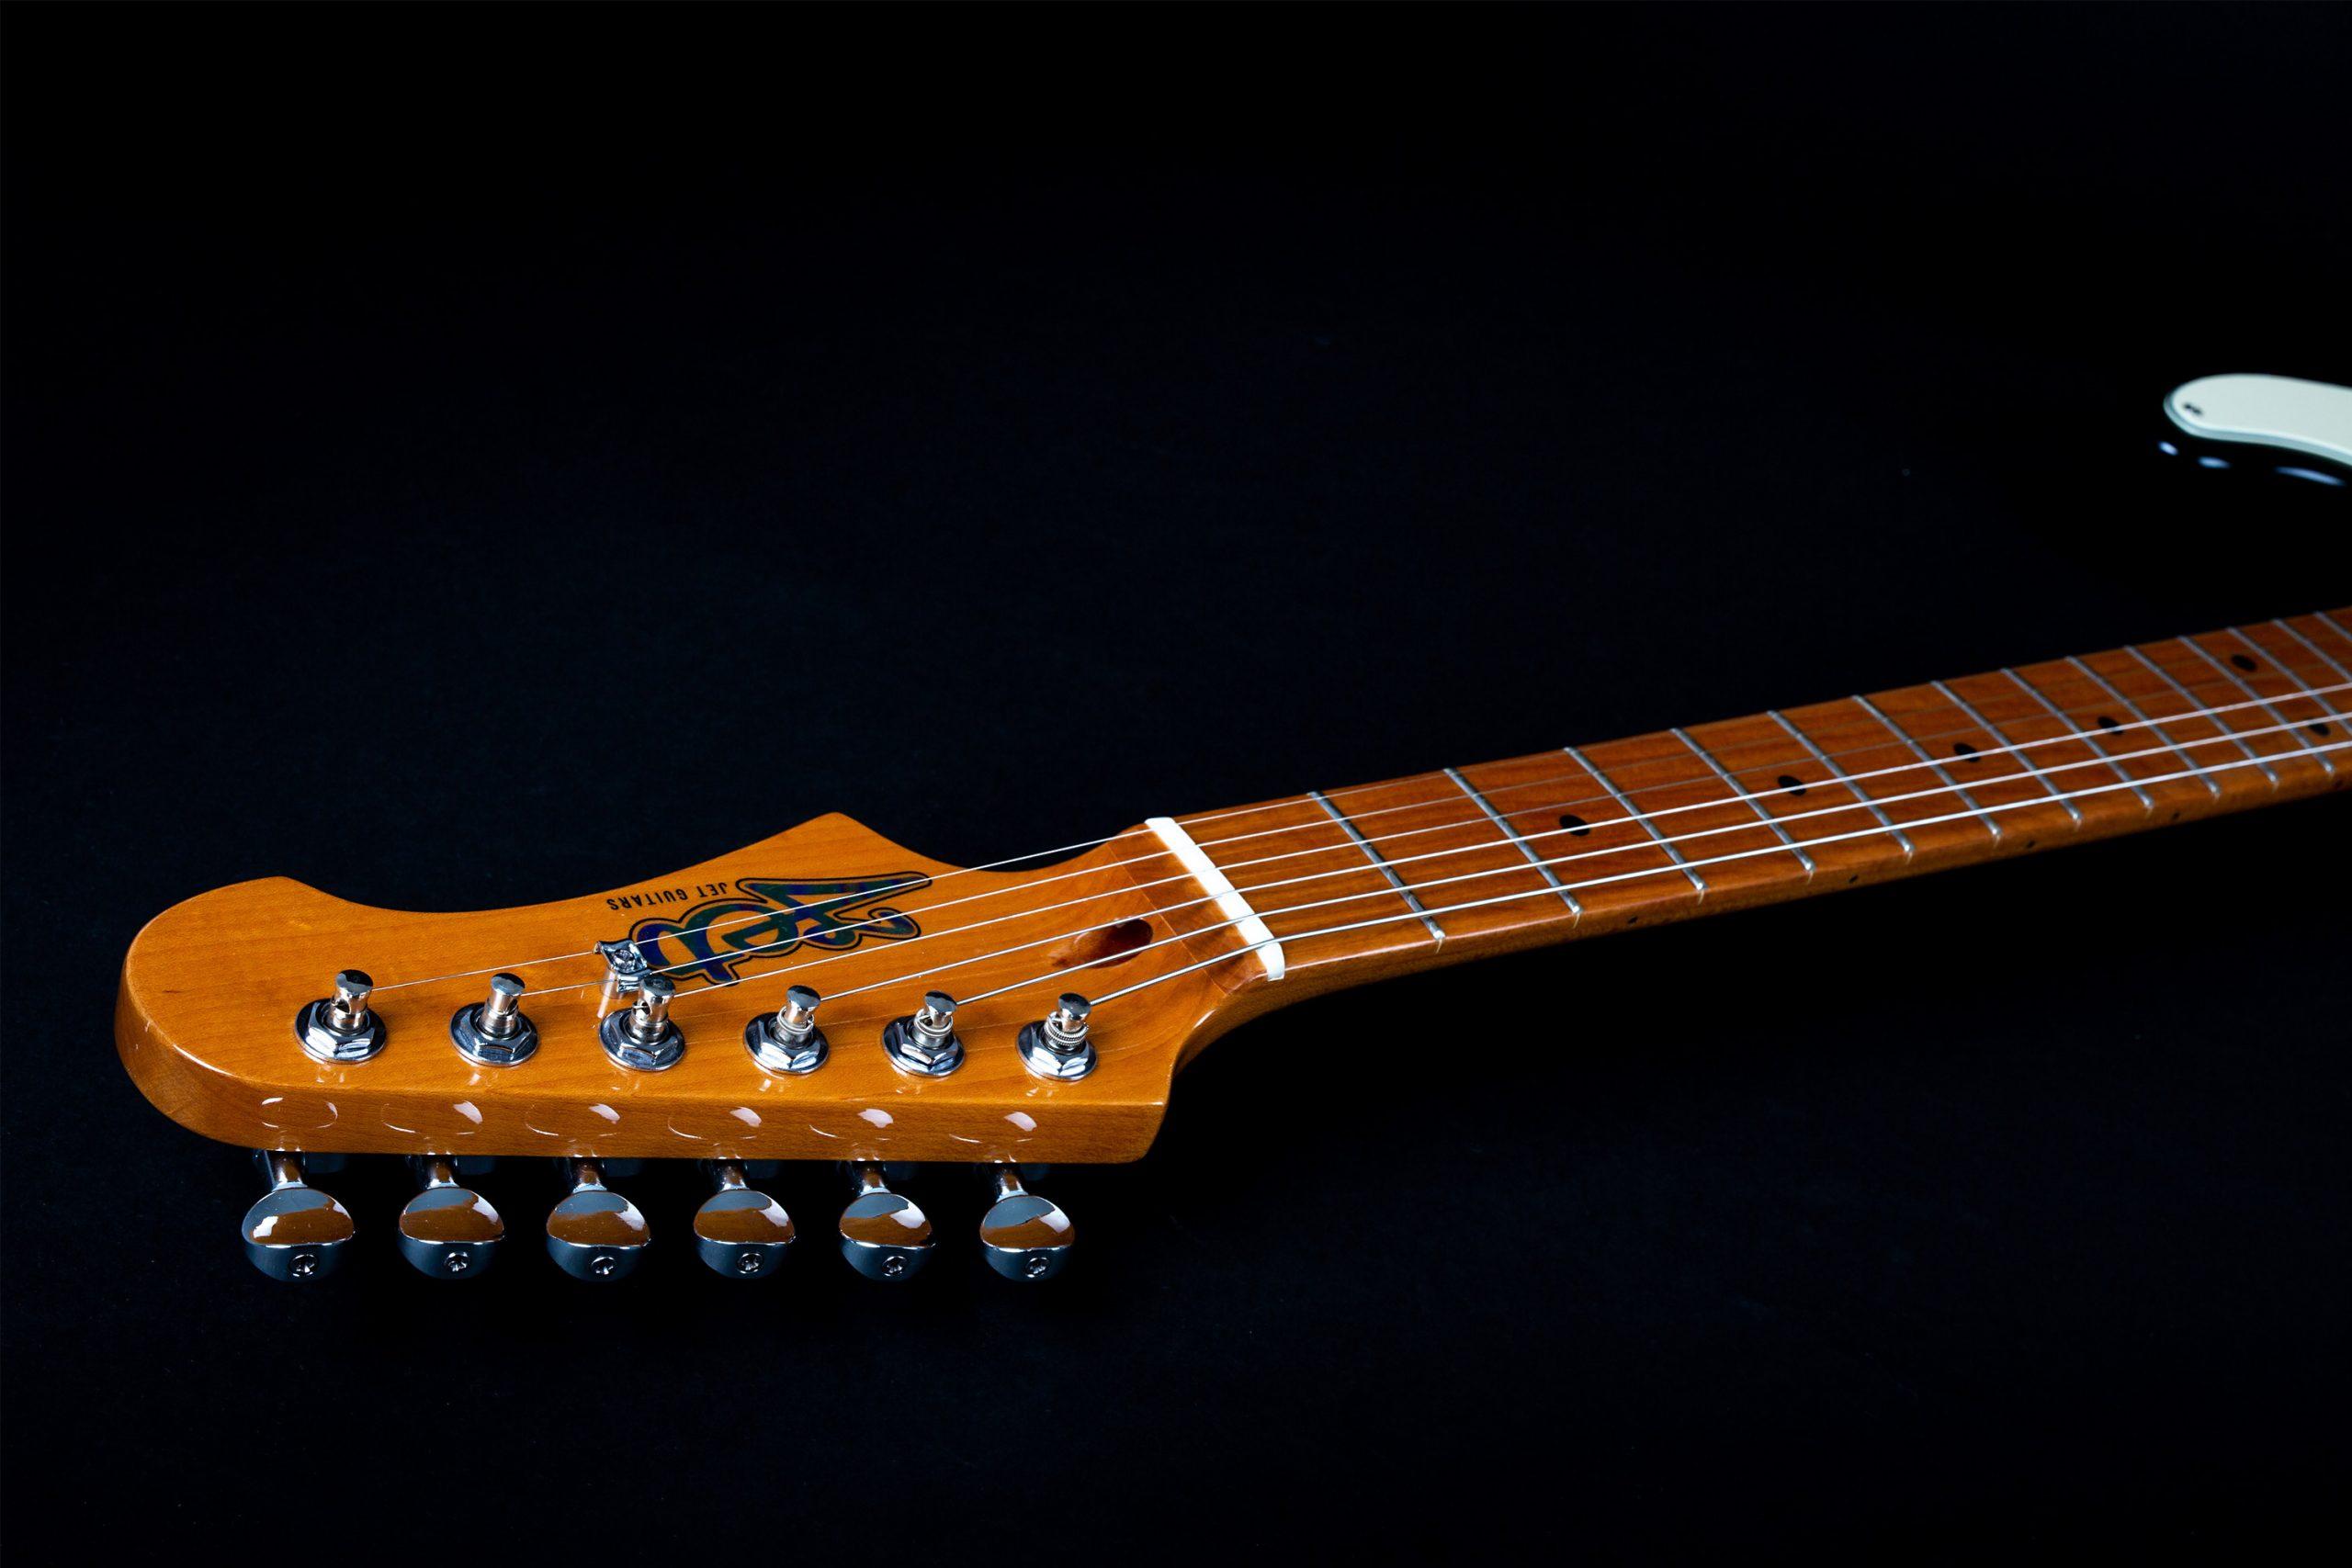 JET Guitars - JT 300 Series